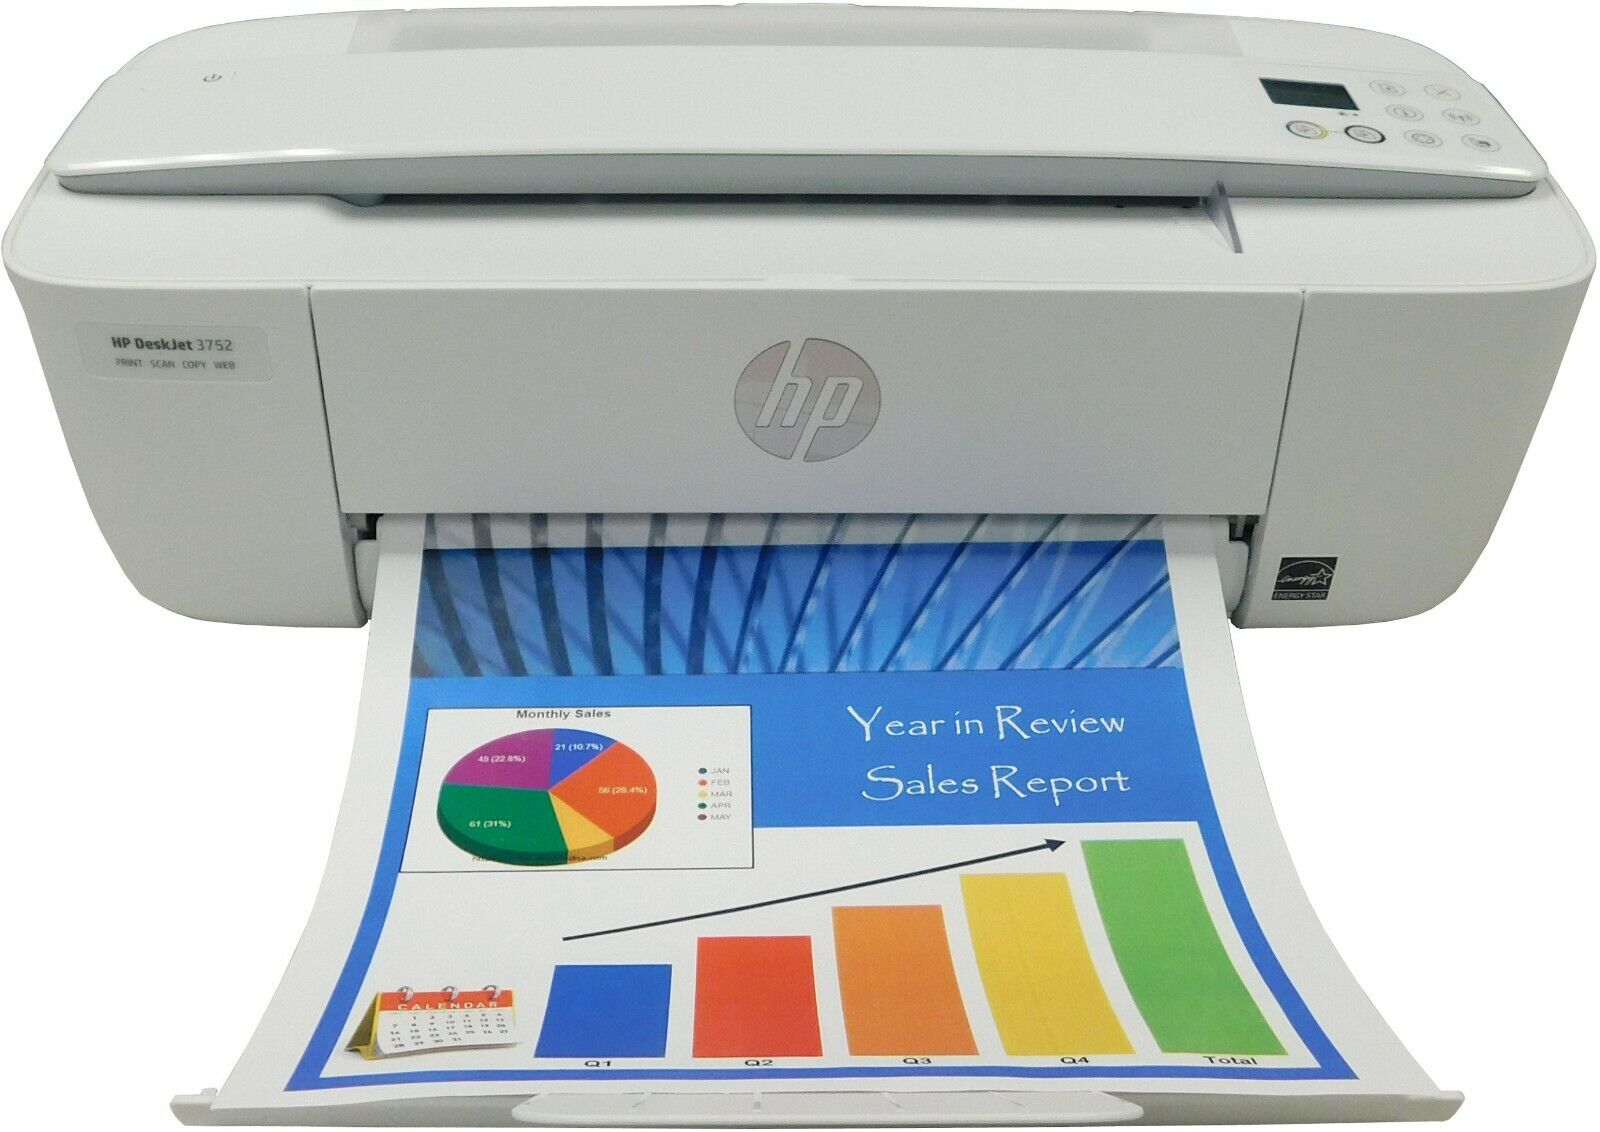 Refurbished HP DeskJet 3752 Wireless All-in-One Compact Prin